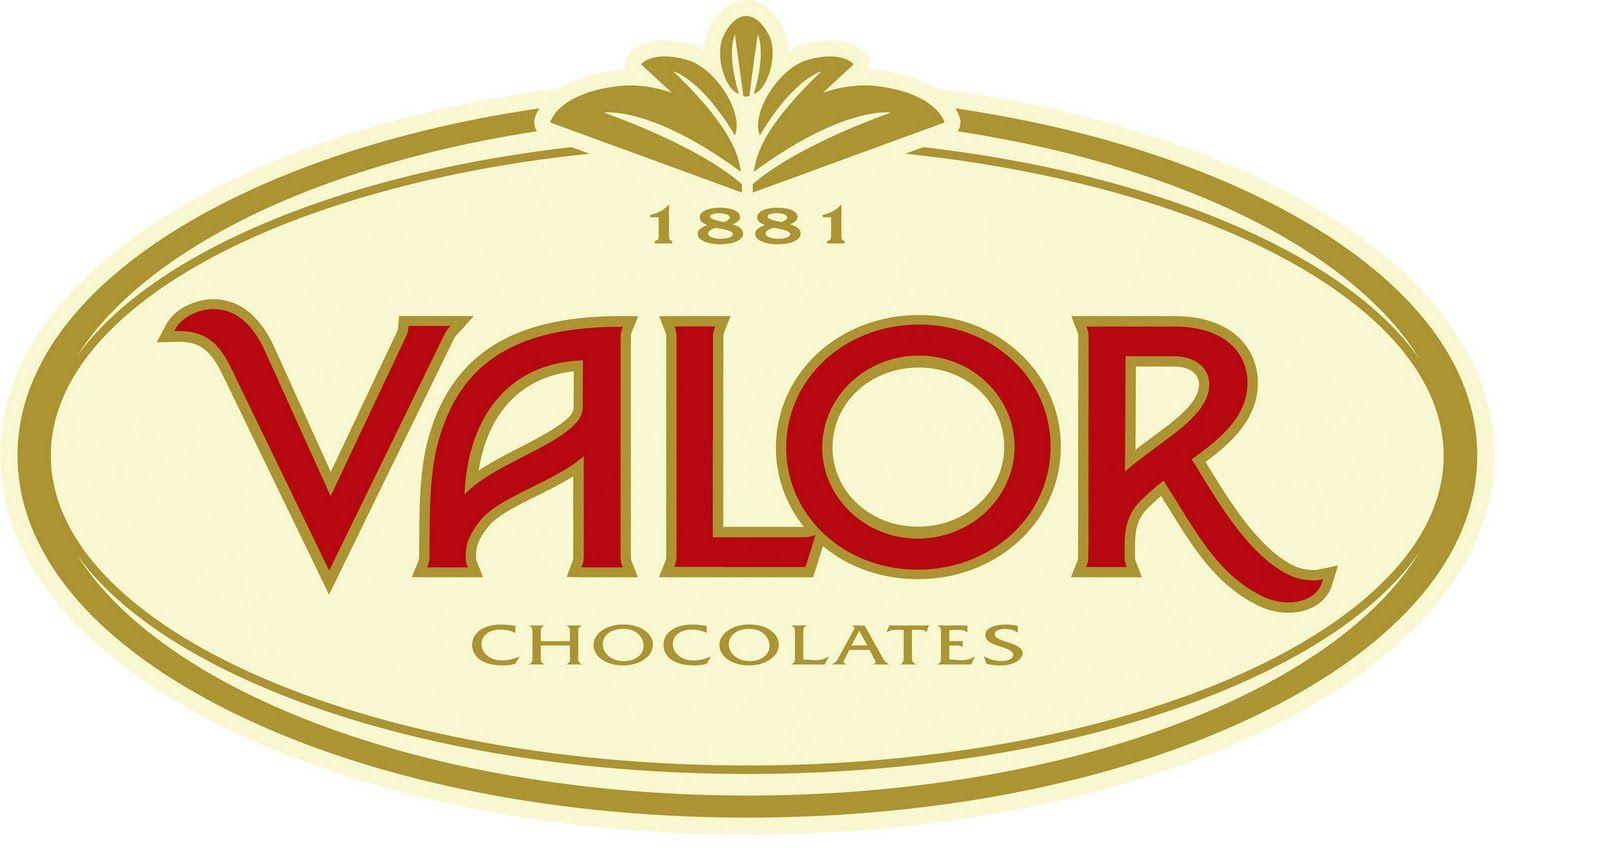 Chocolates Valor logo #design, #brand, #identity, #logo.